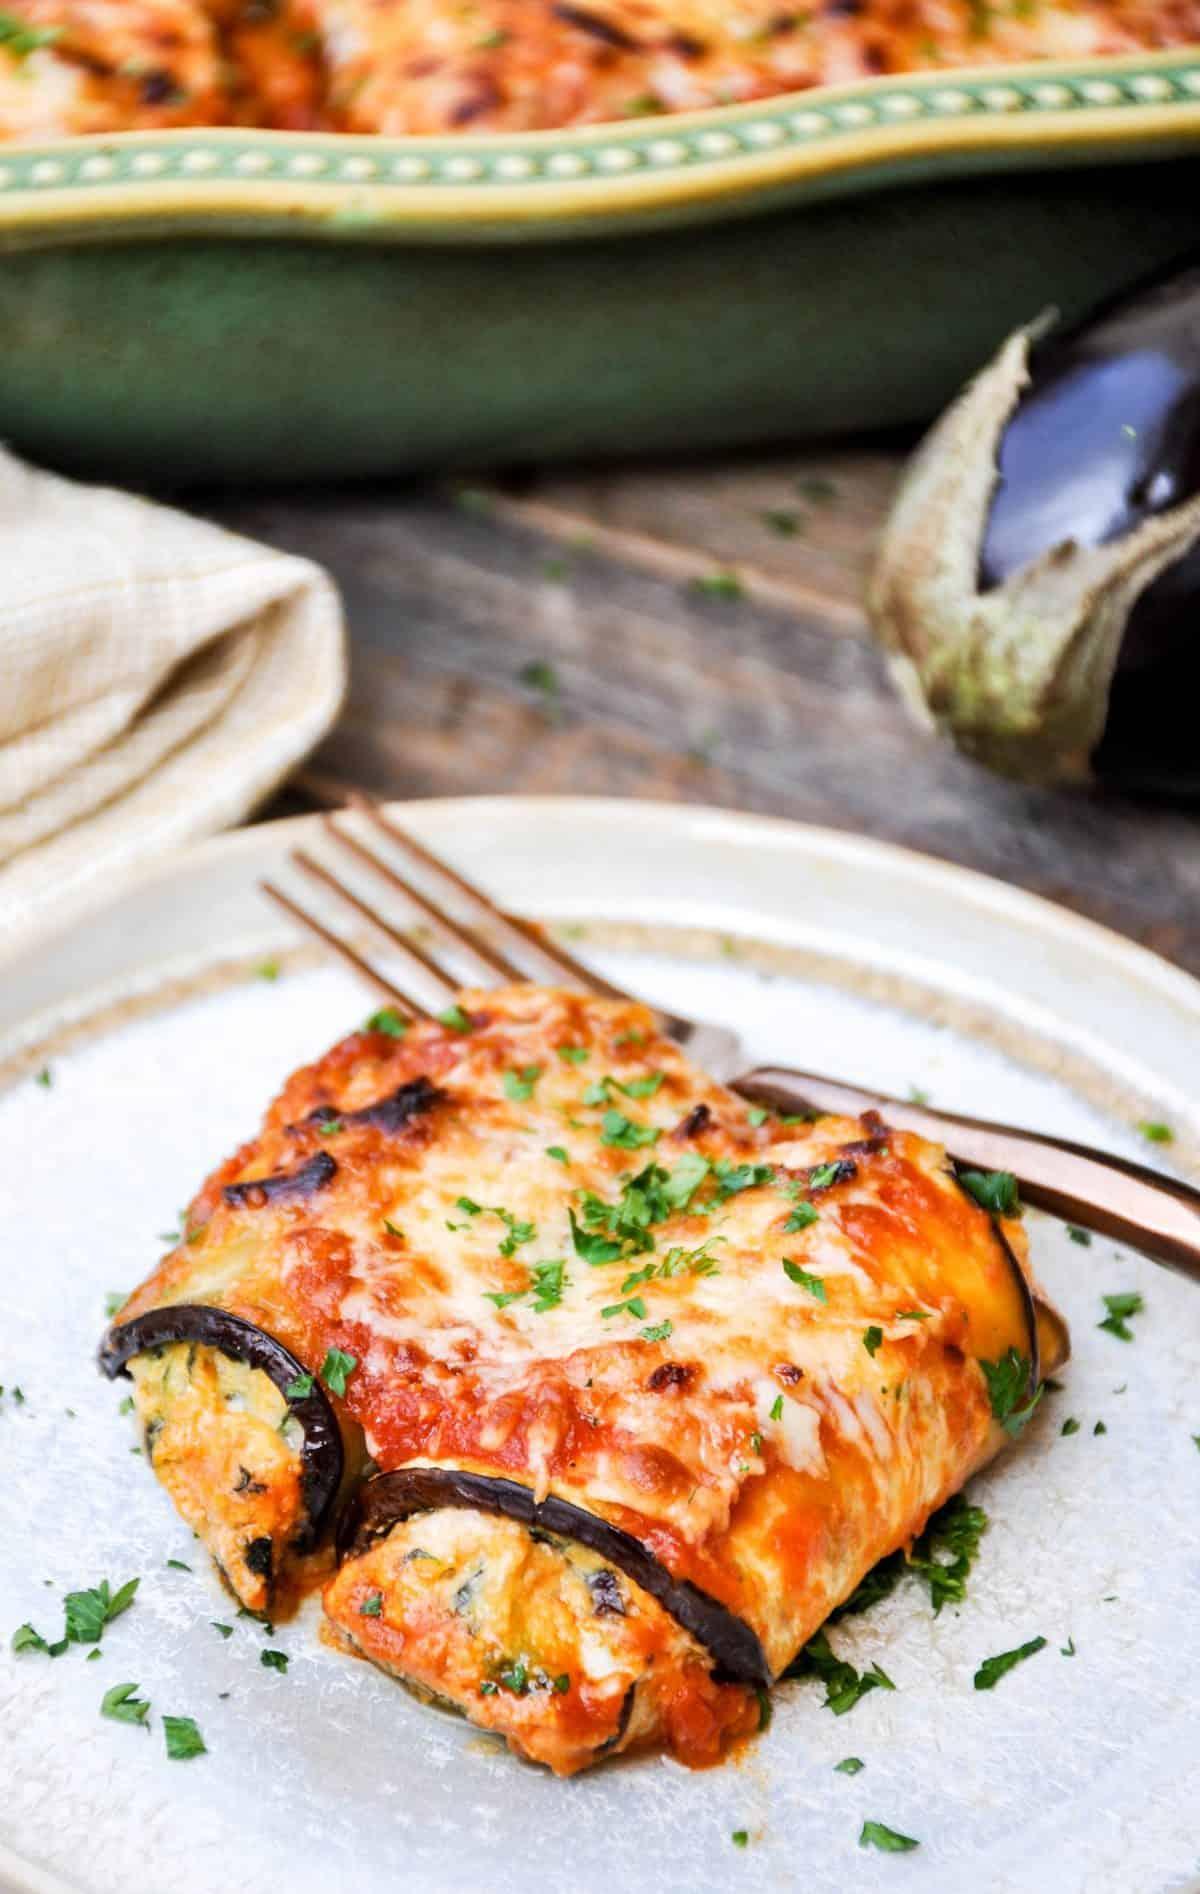 How to Make Eggplant Rollatini